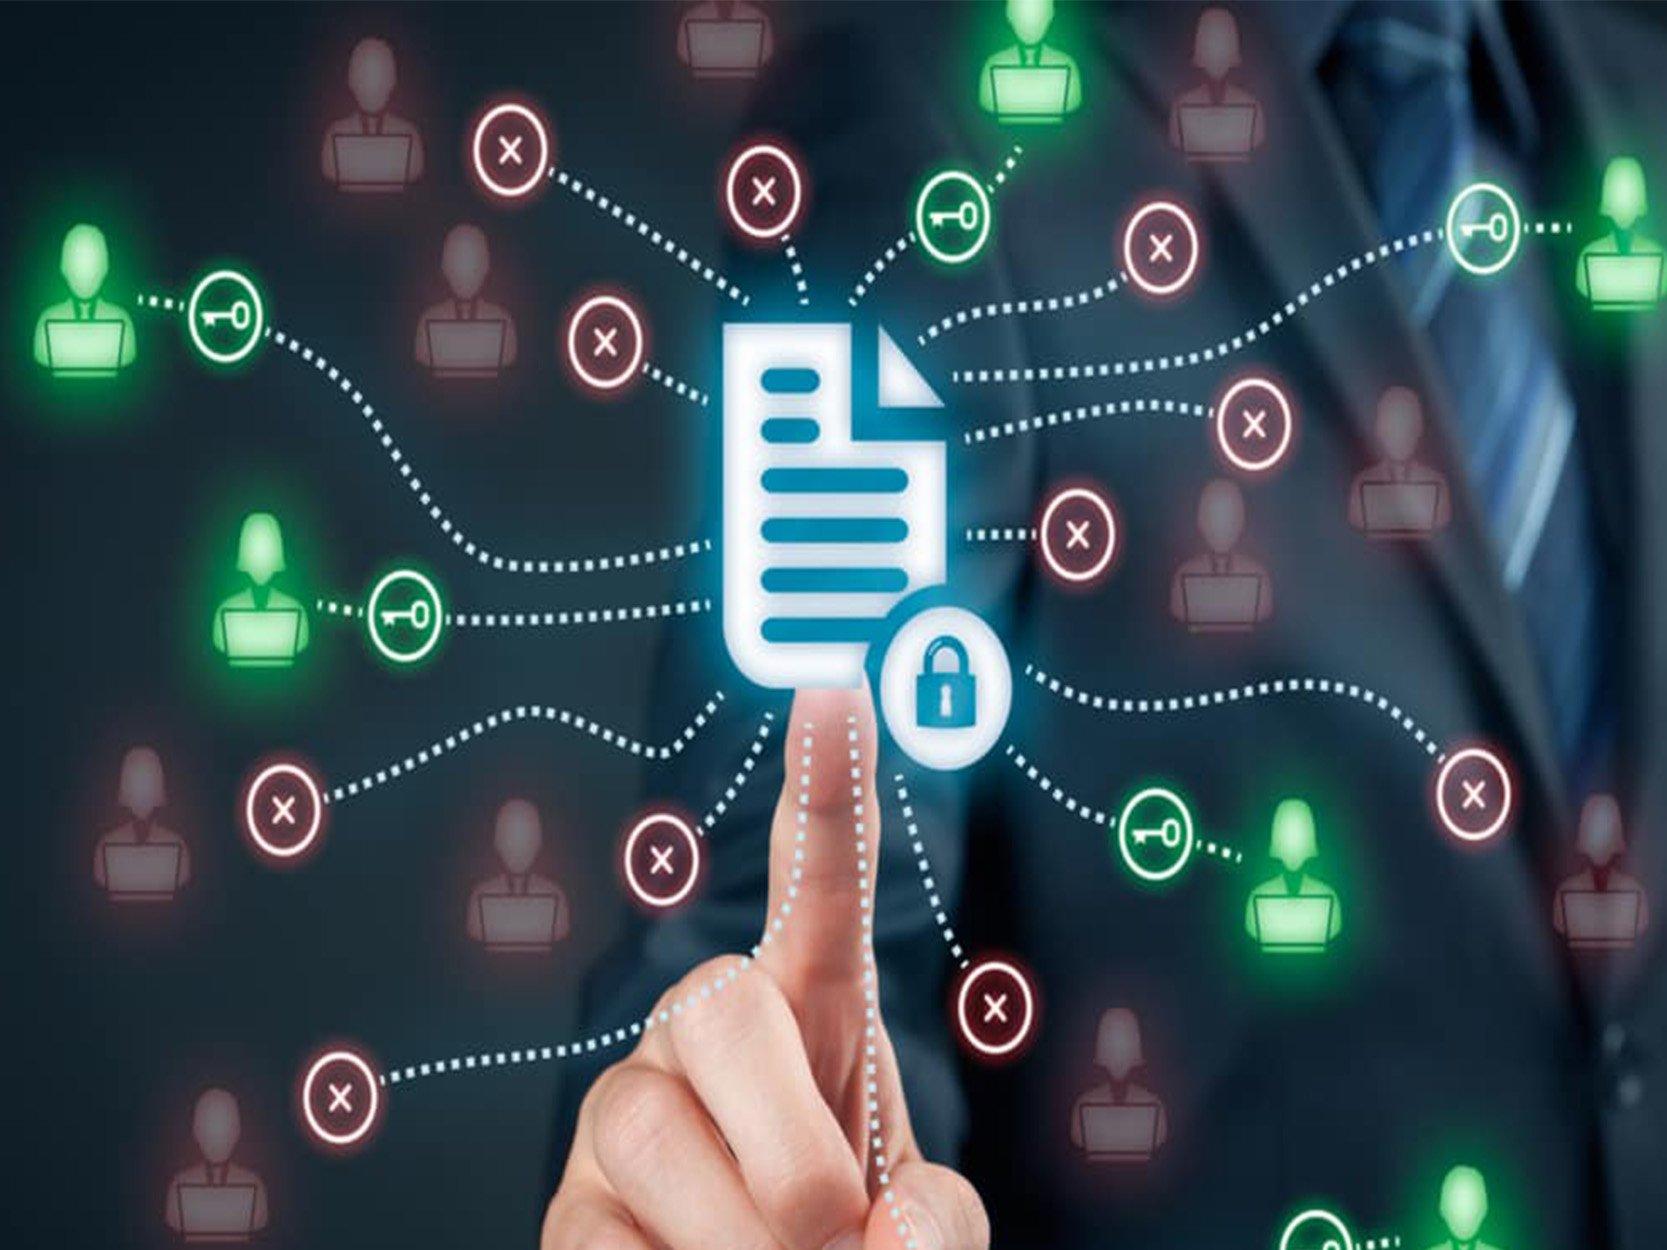 intelligent, safe and efficient security management system